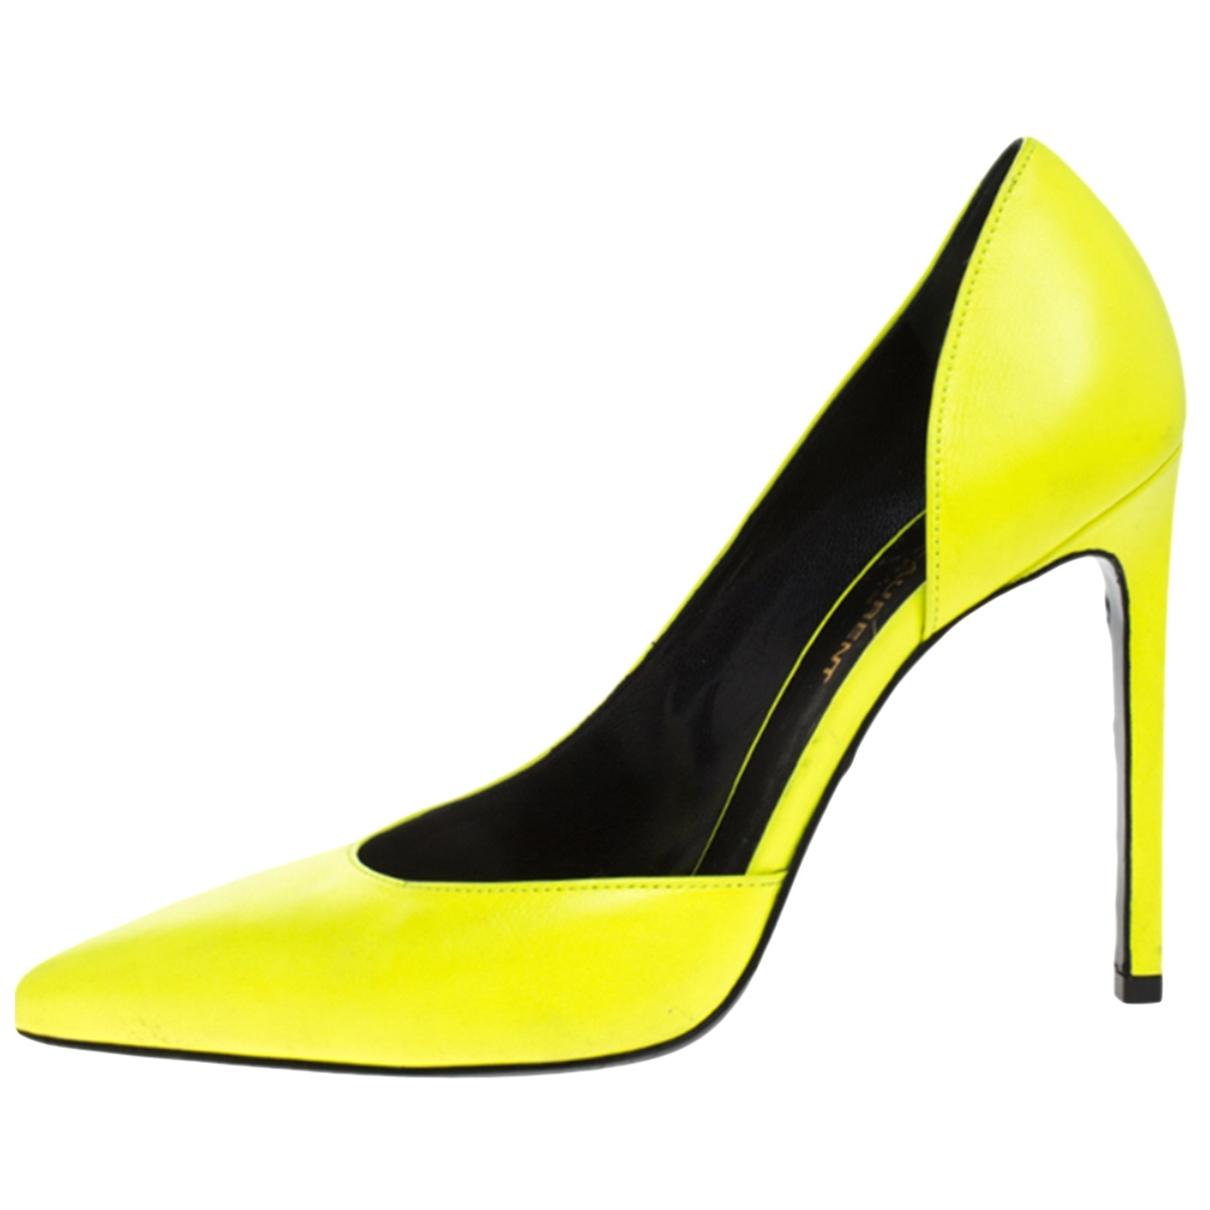 Saint Laurent D'orsay Yellow Leather Heels for Women 6.5 US